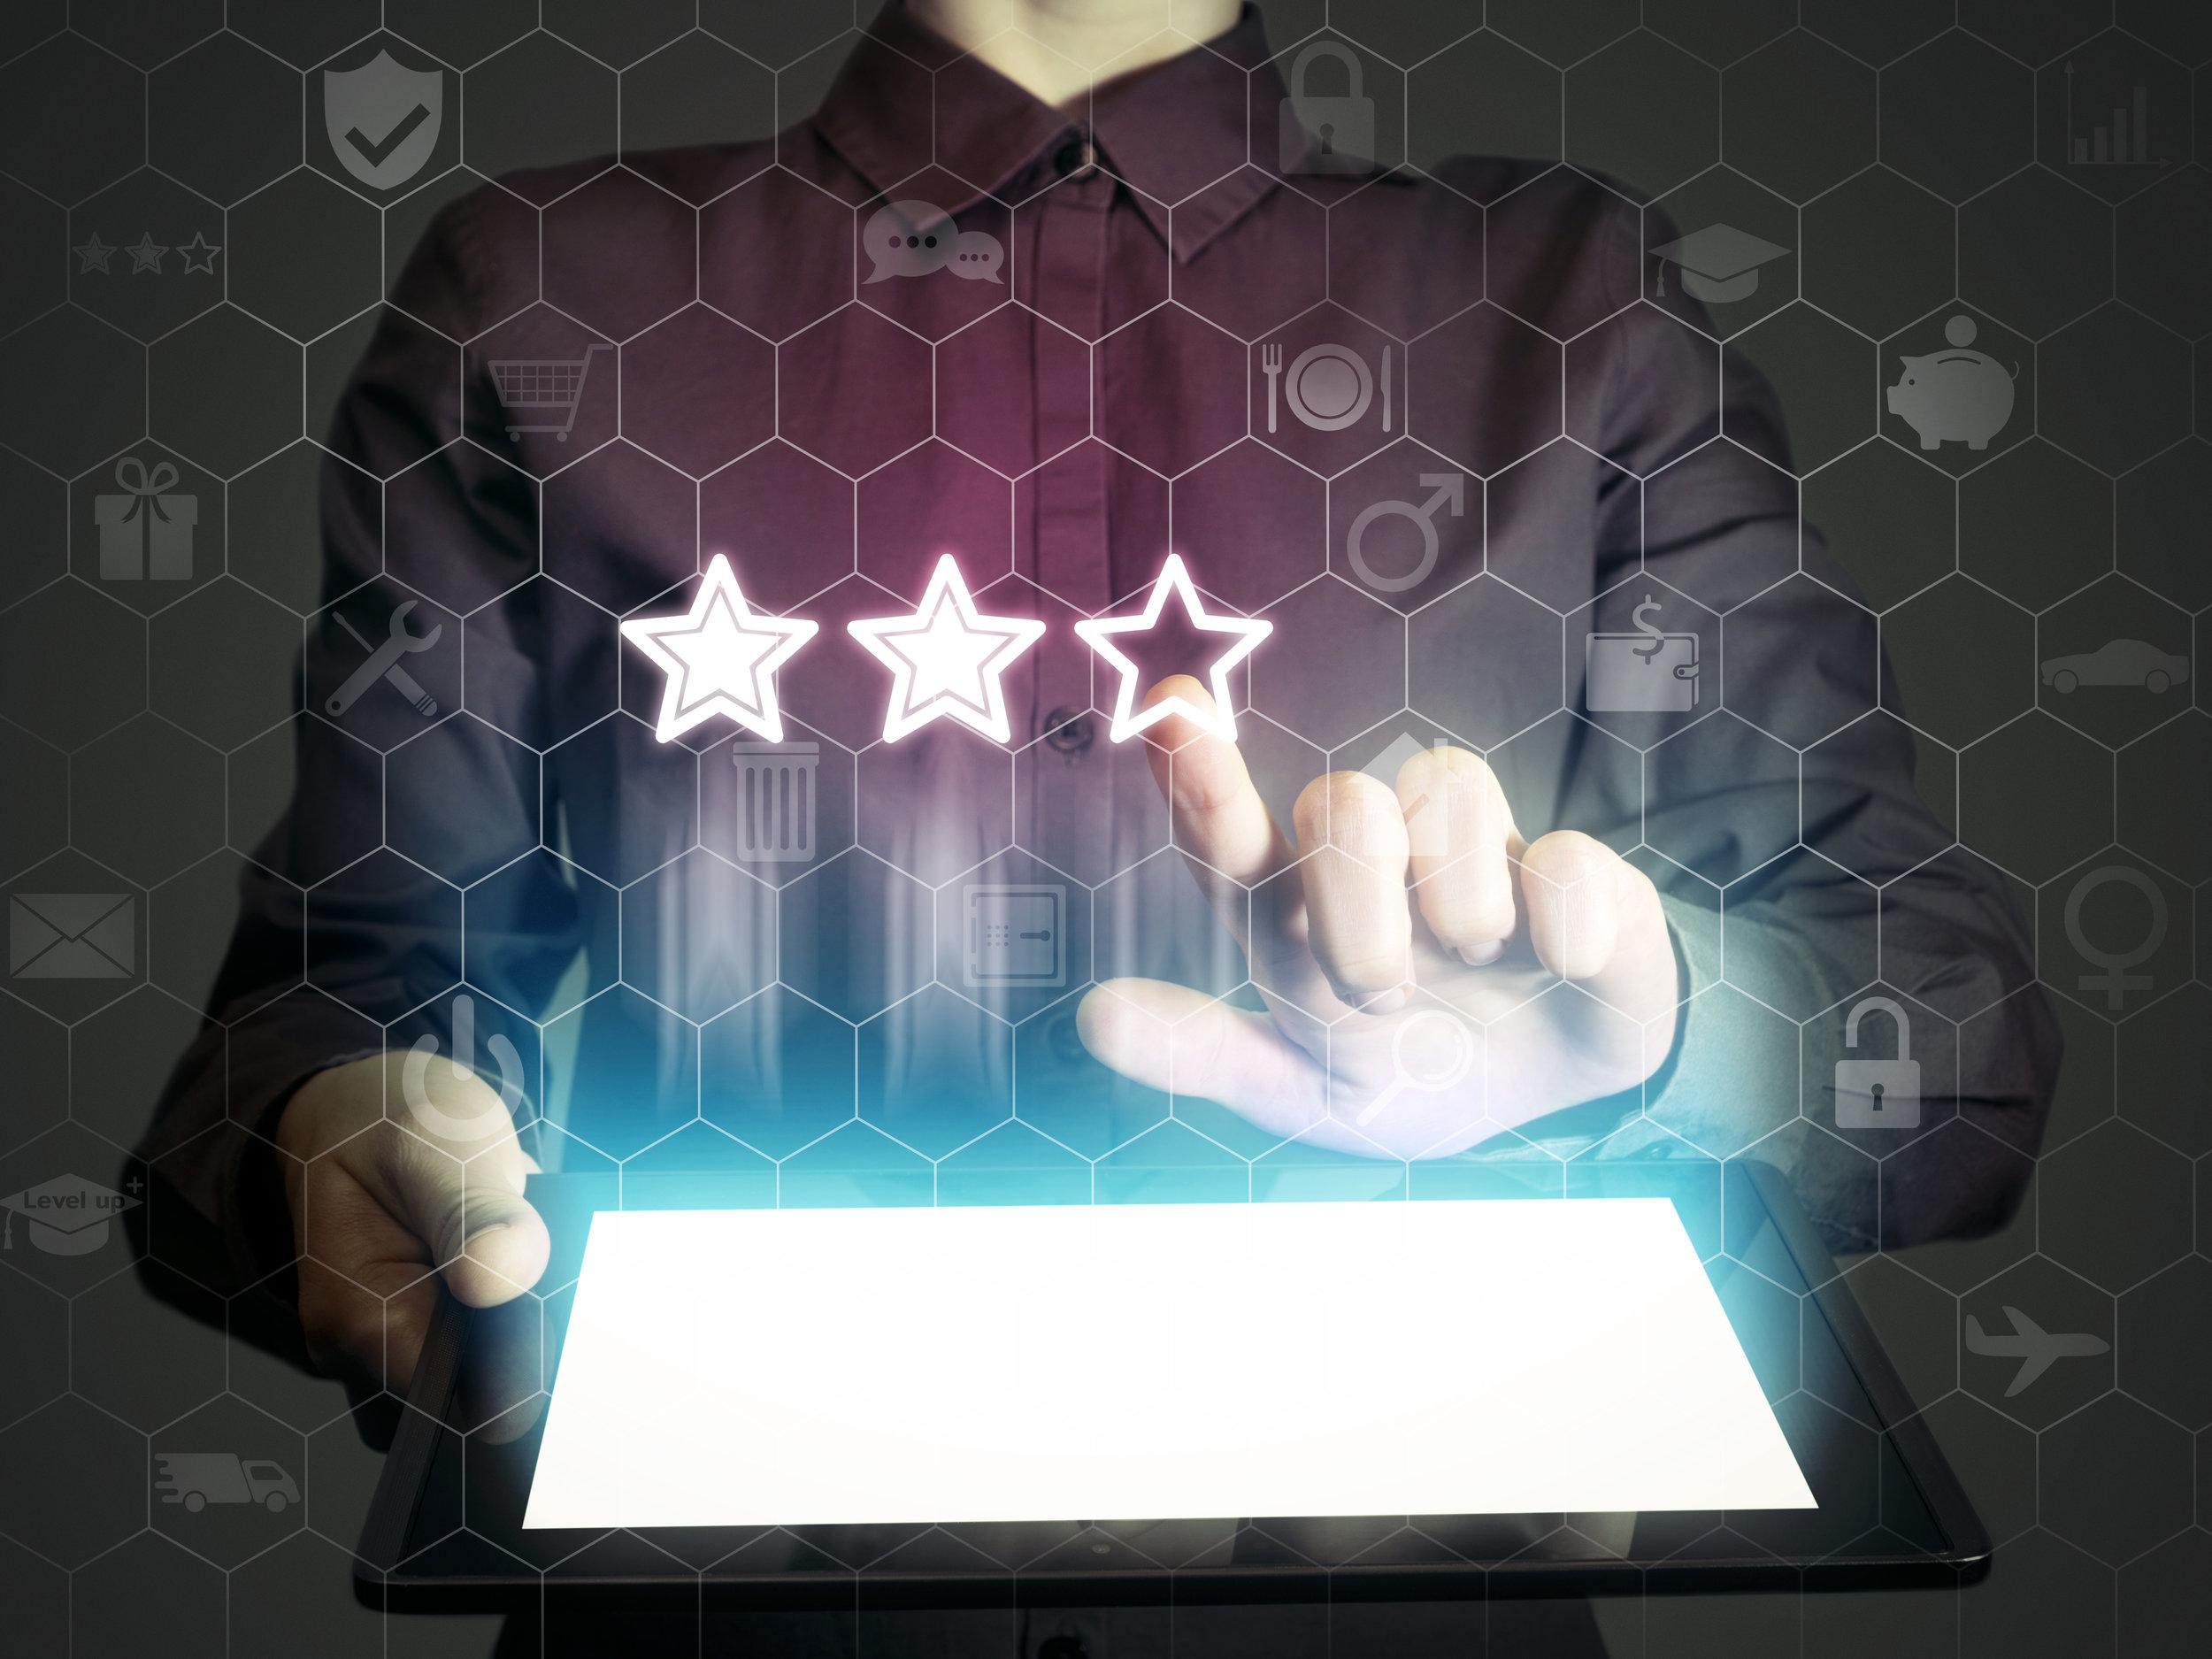 online-supply-chain-reviews.jpg